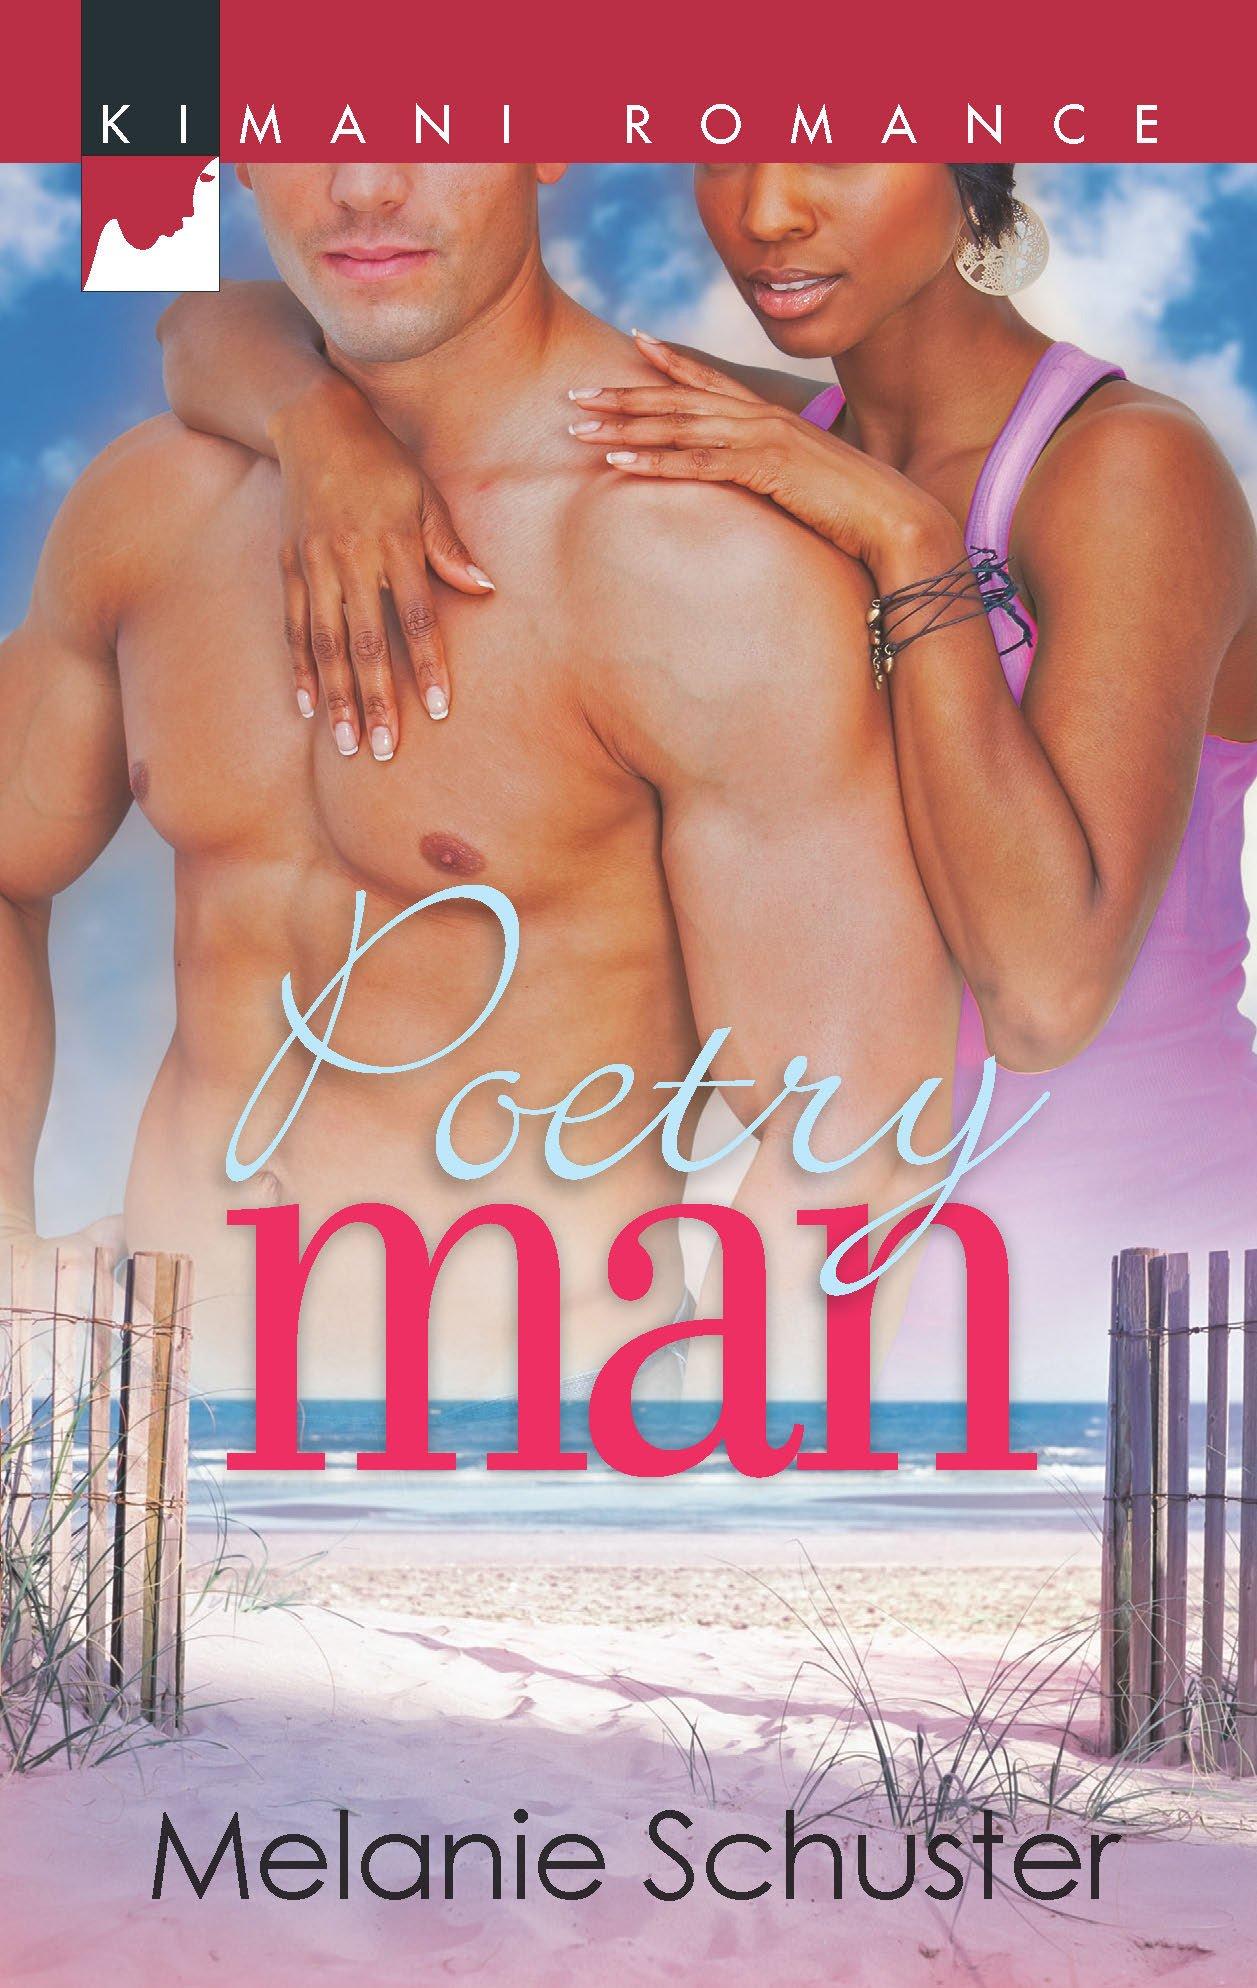 Amazon.com: Poetry Man (Kimani Romance) (9780373862856): Melanie Schuster:  Books